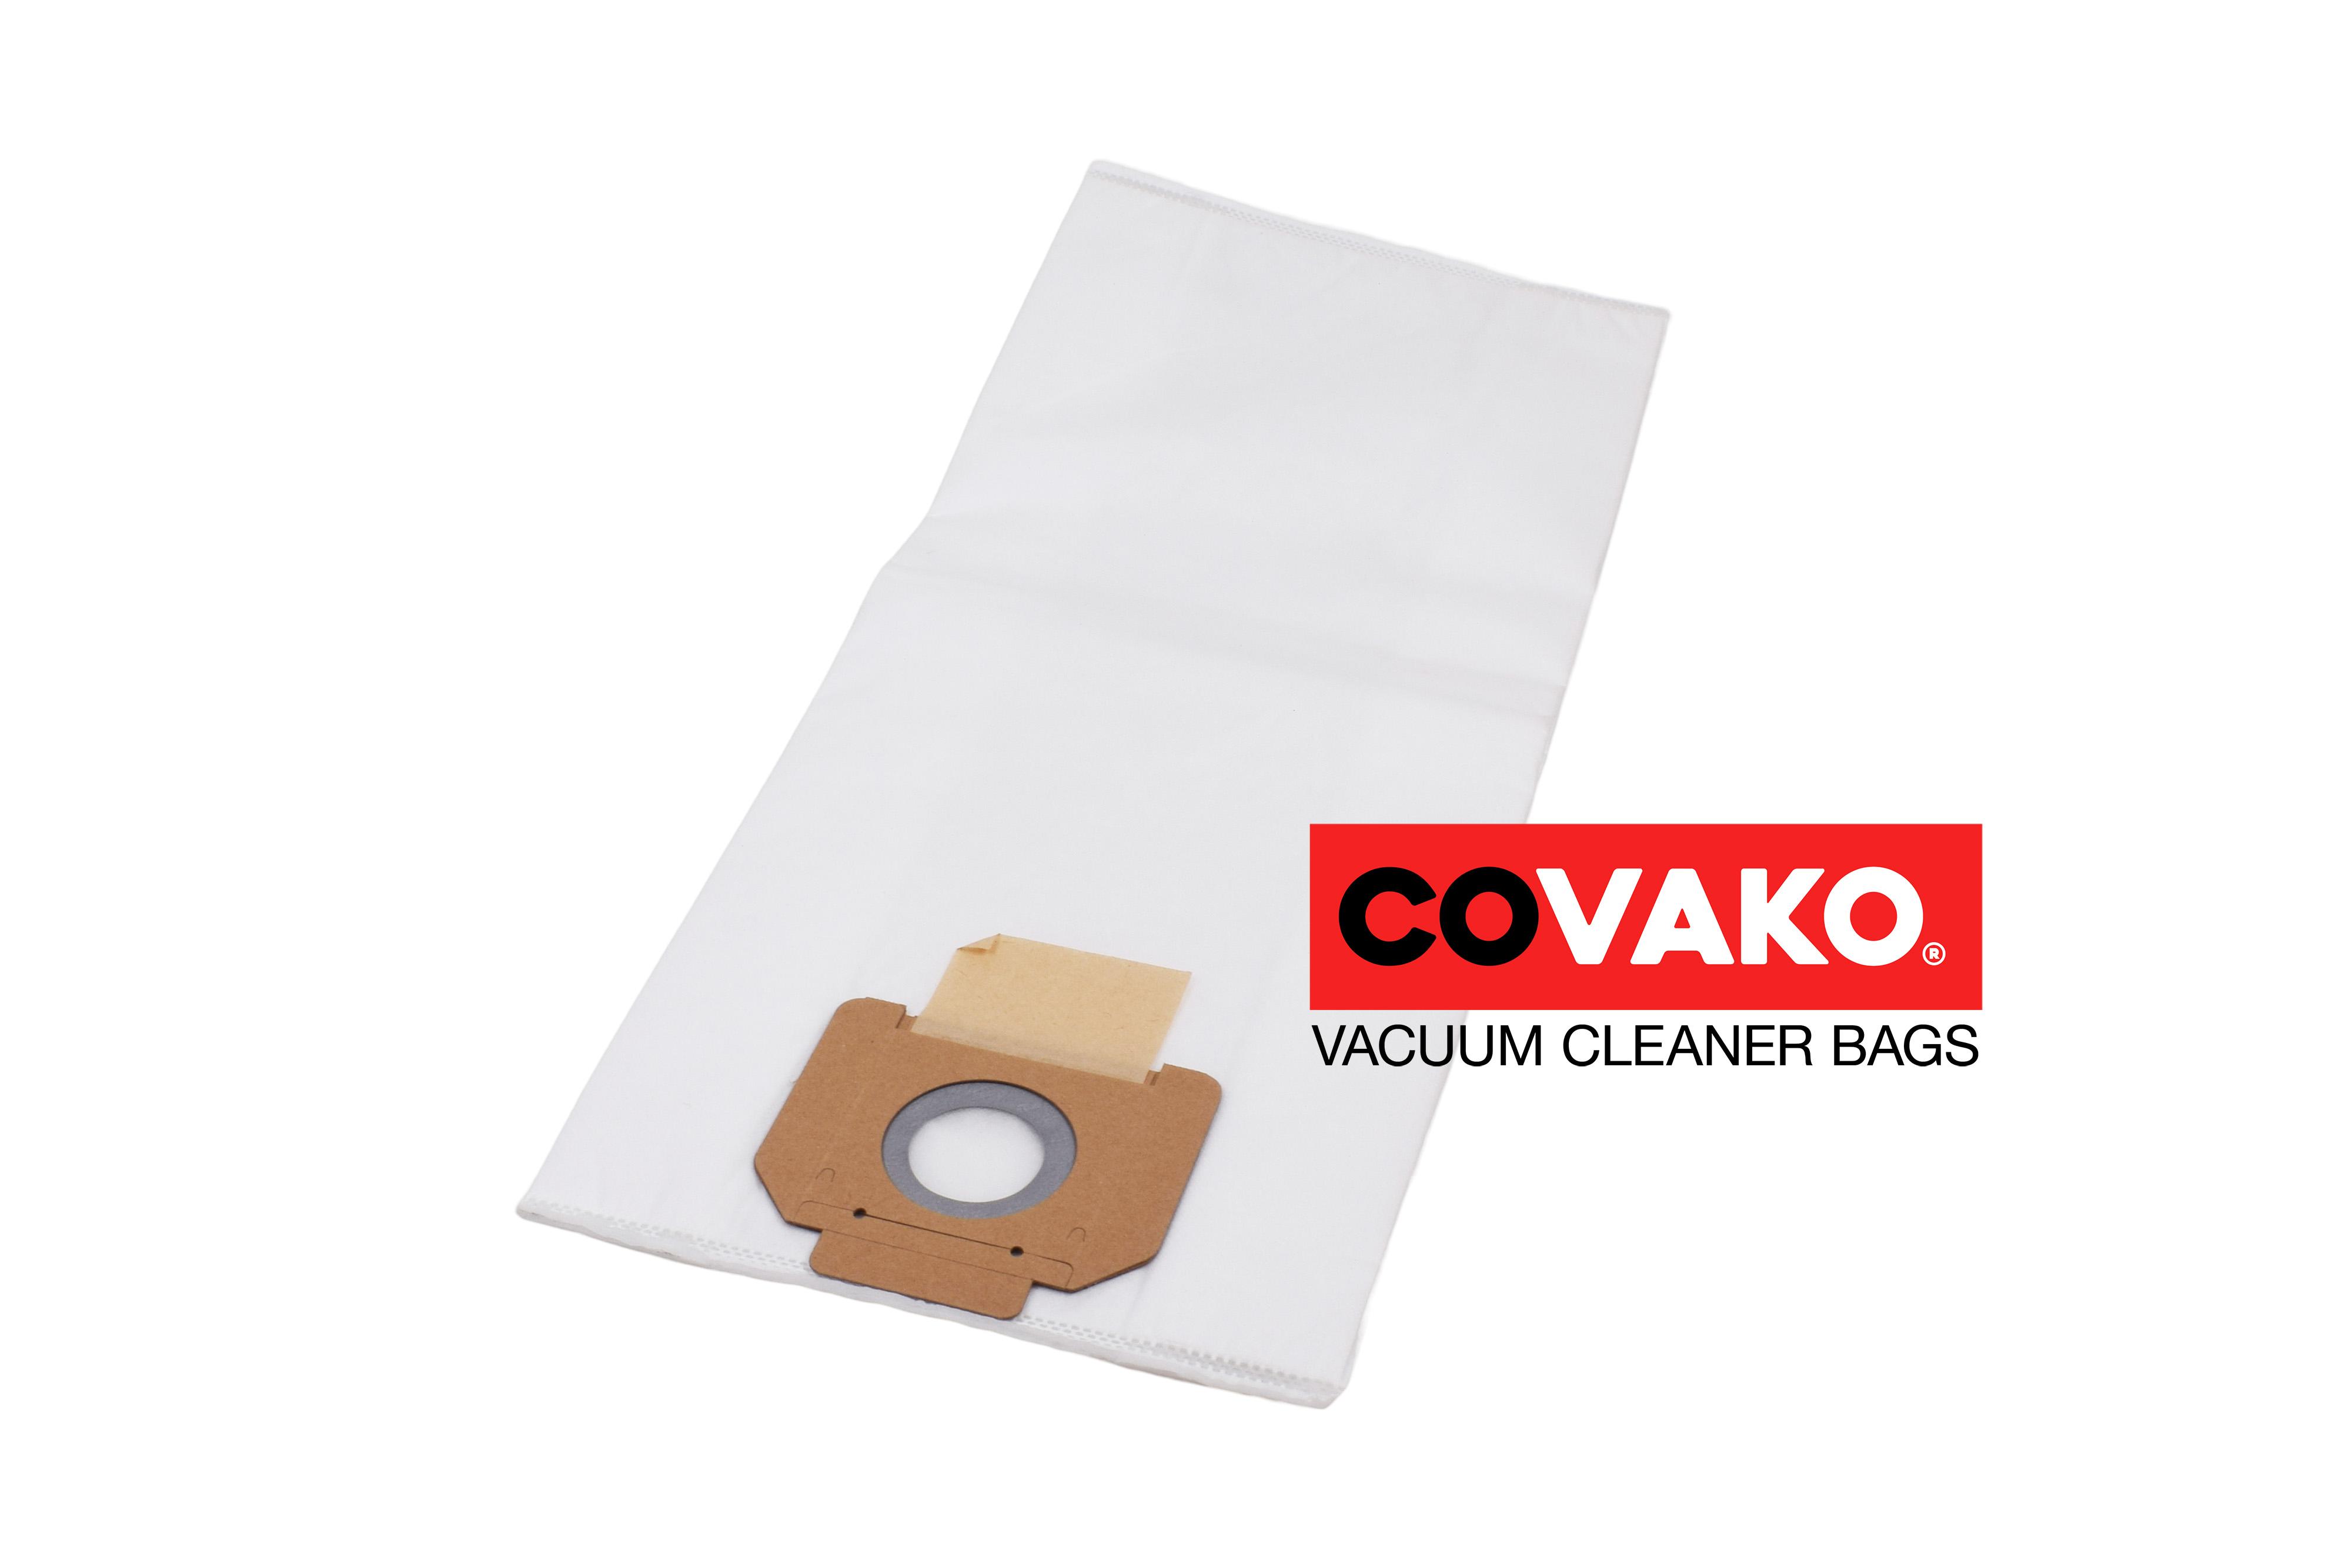 Fakir IC 640 KF / Synthétique - Fakir sacs d'aspirateur